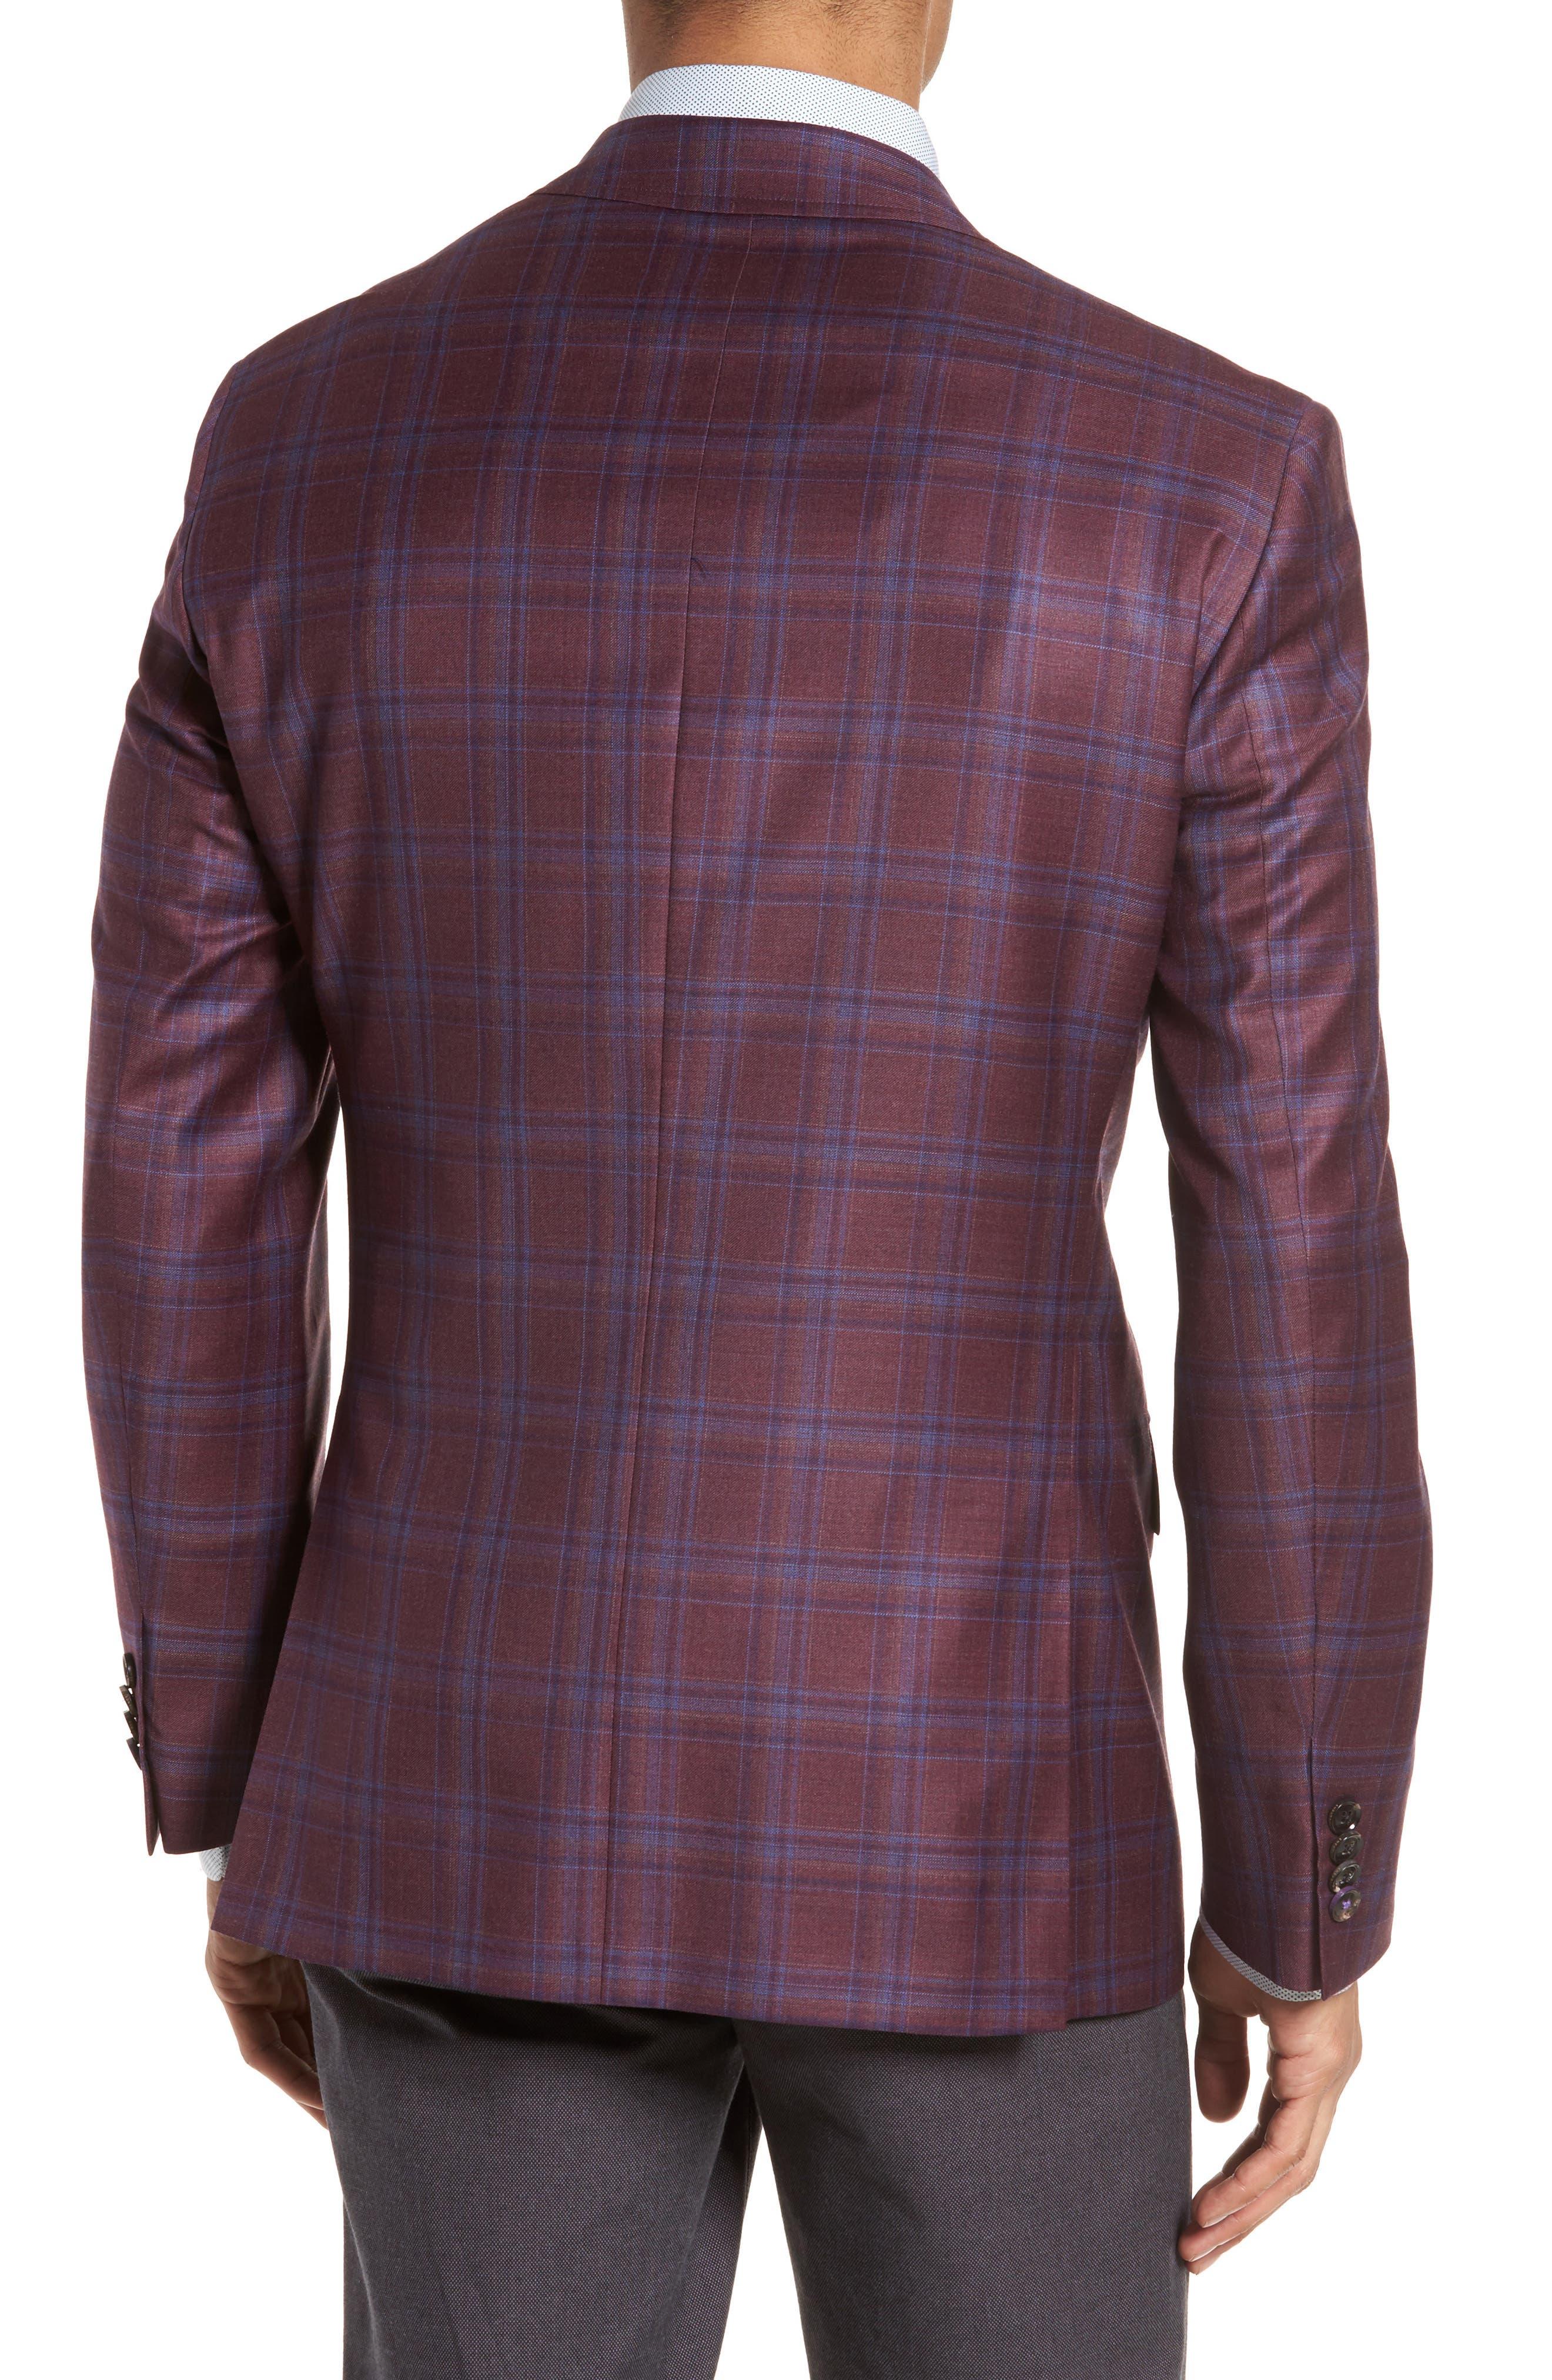 Jay Trim Fit Plaid Wool Sport Coat,                             Alternate thumbnail 2, color,                             600